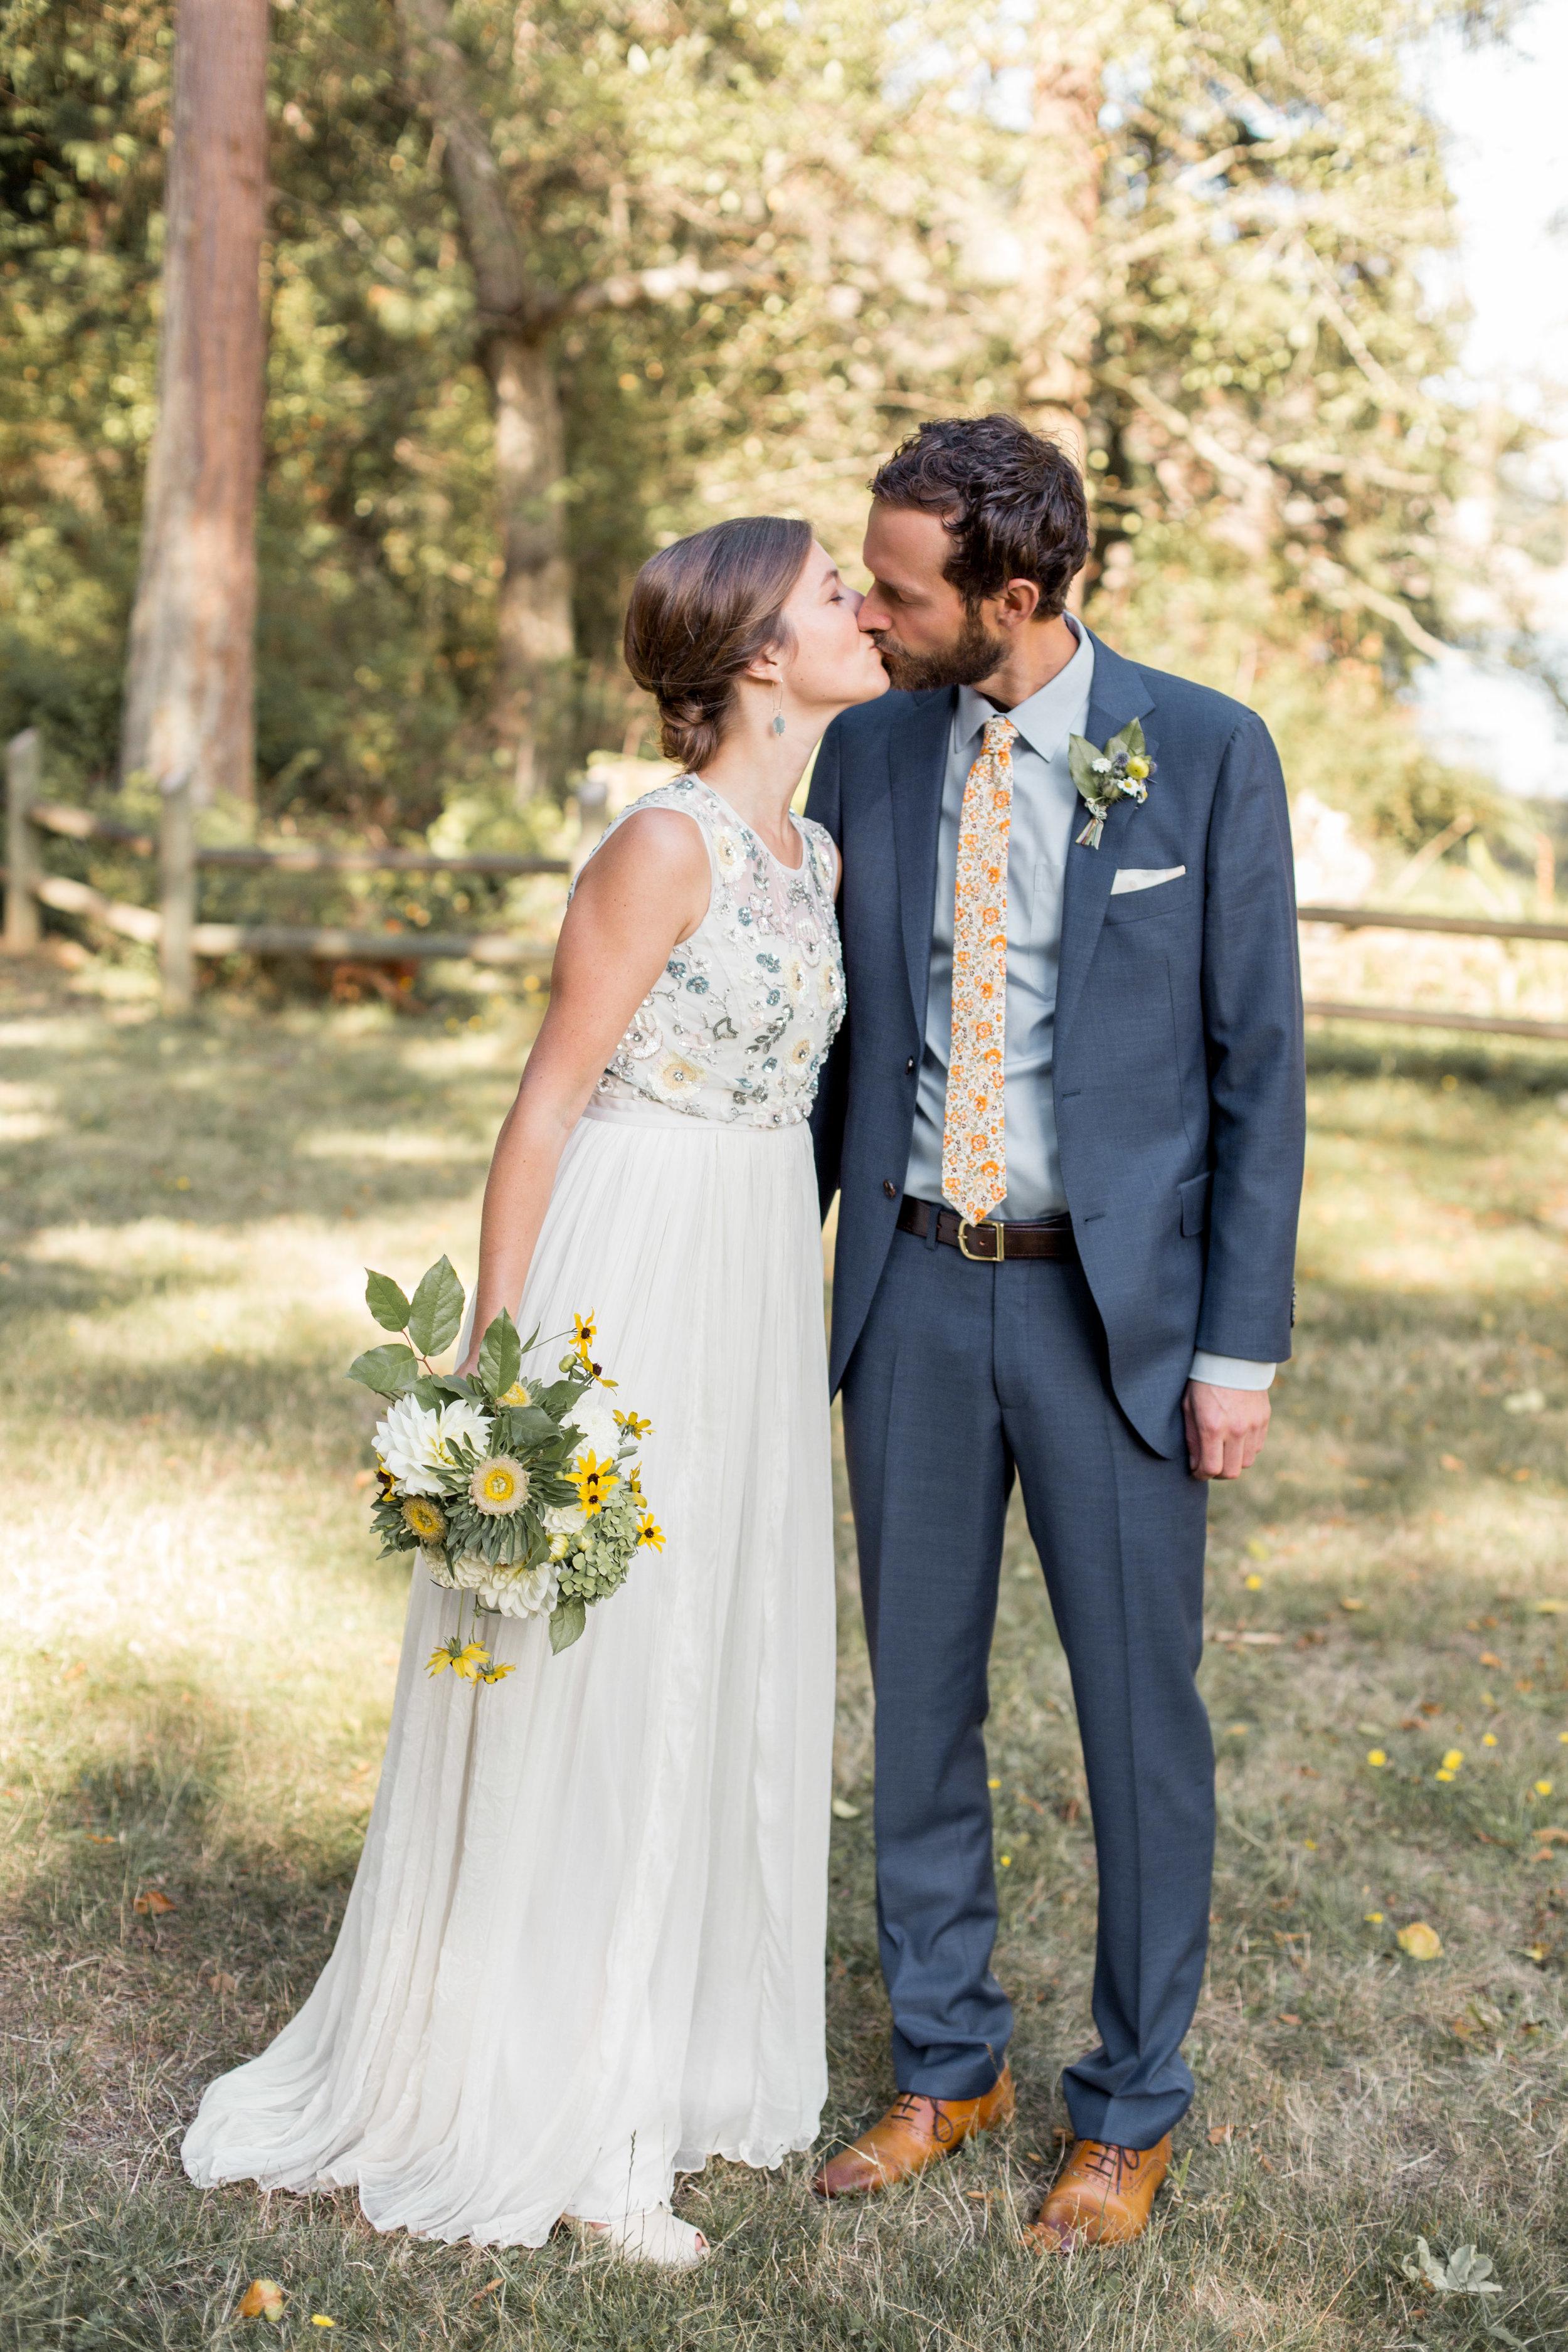 Briana&Derek_Portraits-45.jpg